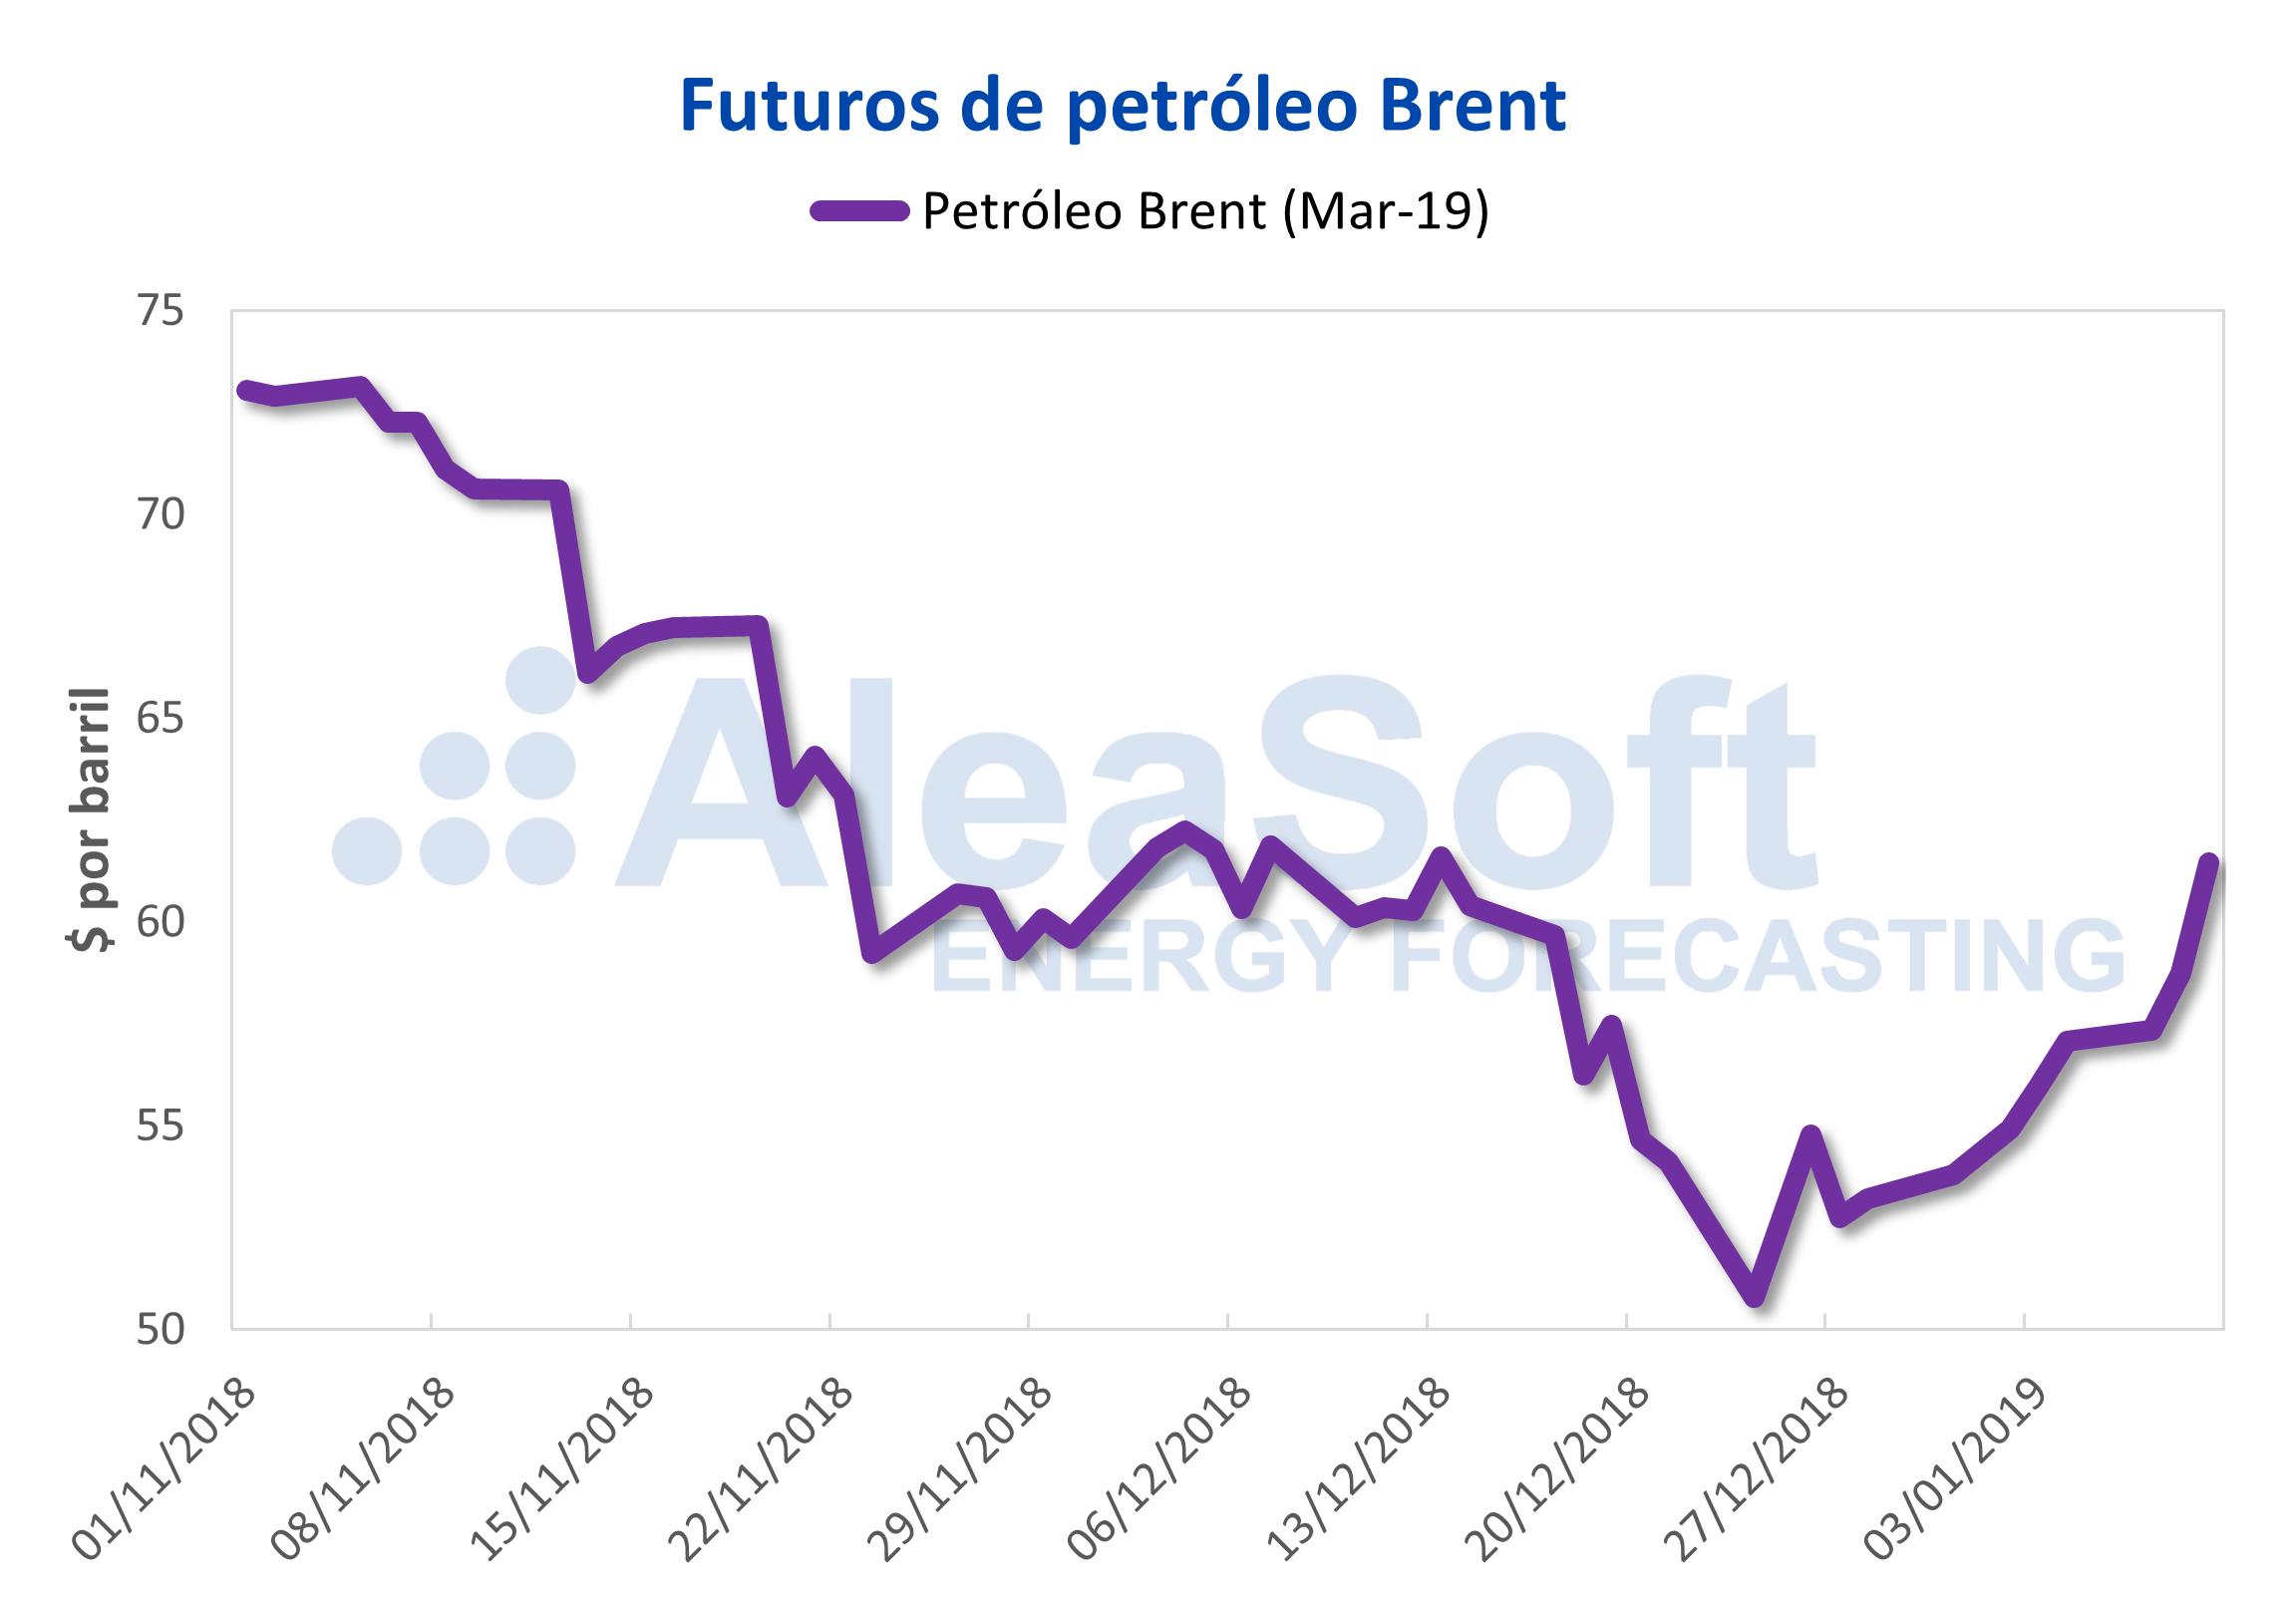 AleaSoft - Futuros de petróleo Brent